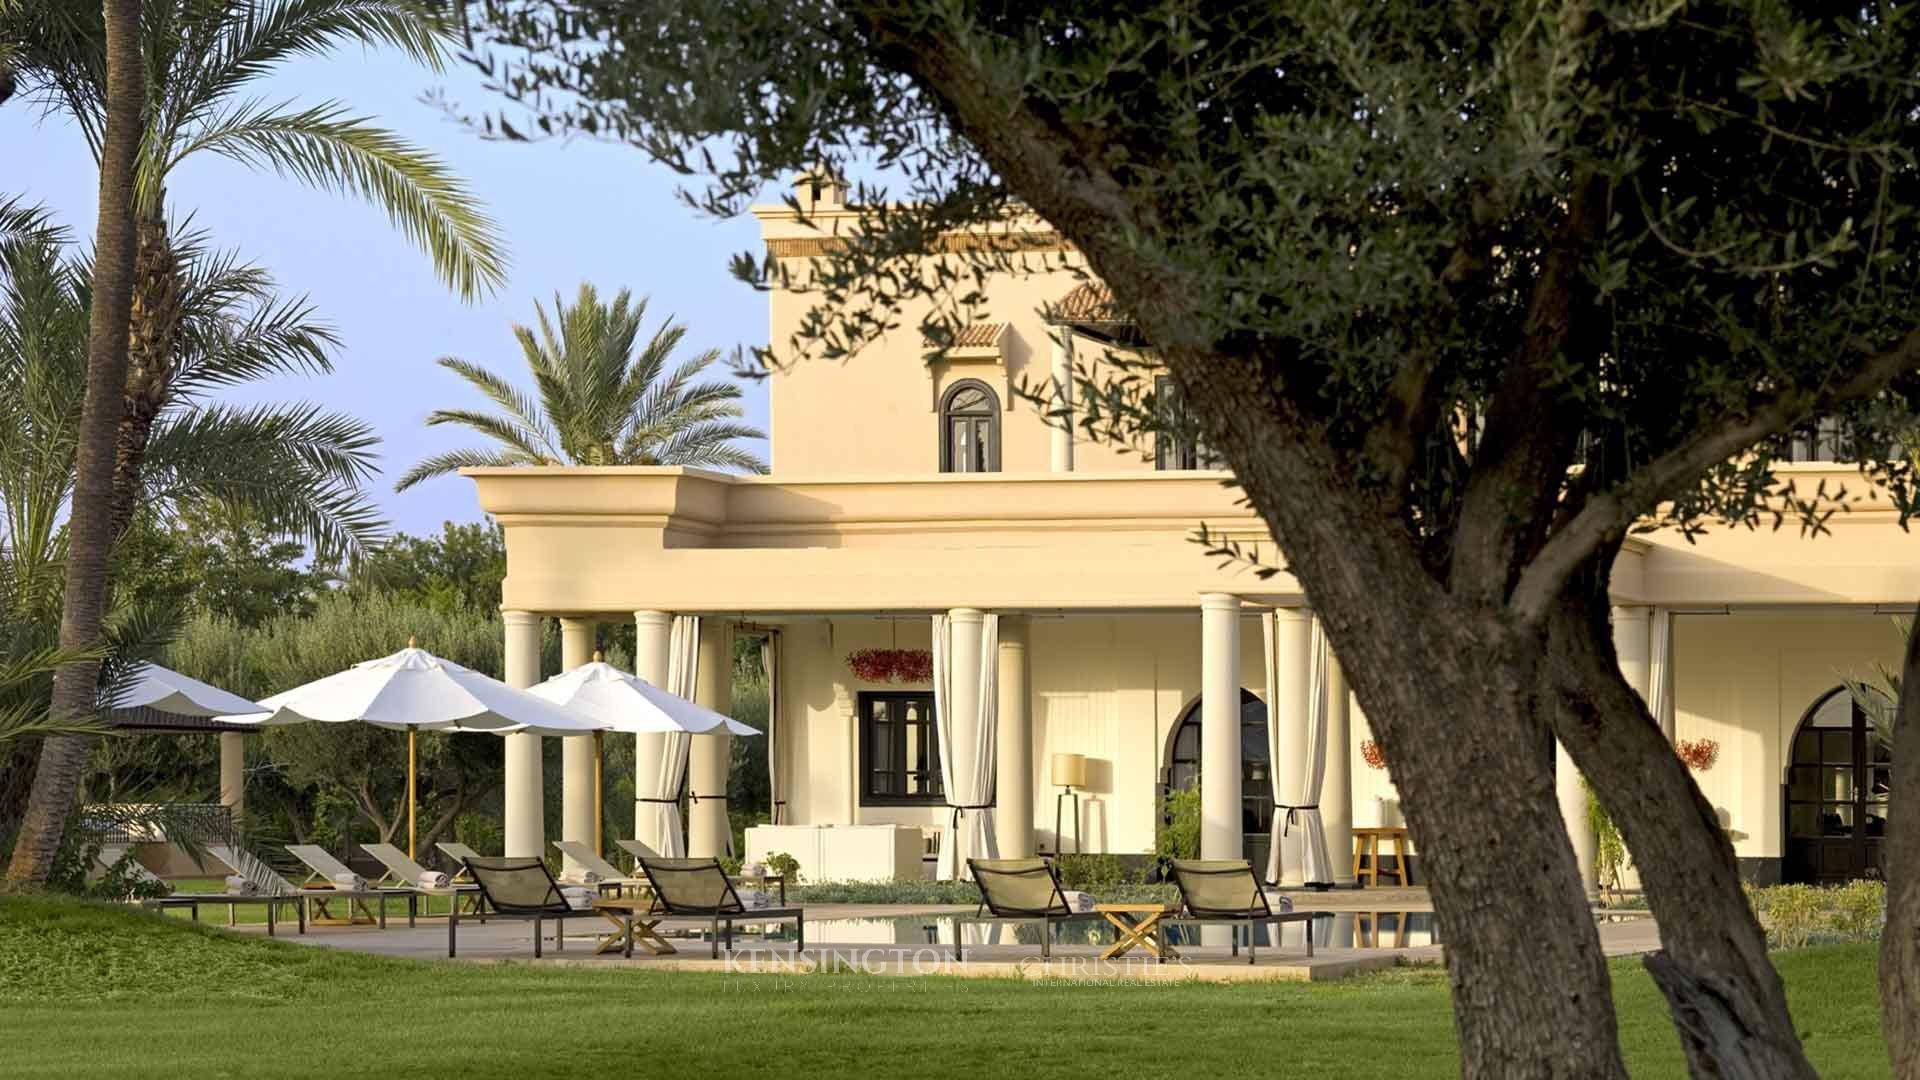 KPPM01210: Villa Sanjena Luxury Villa Marrakech Morocco